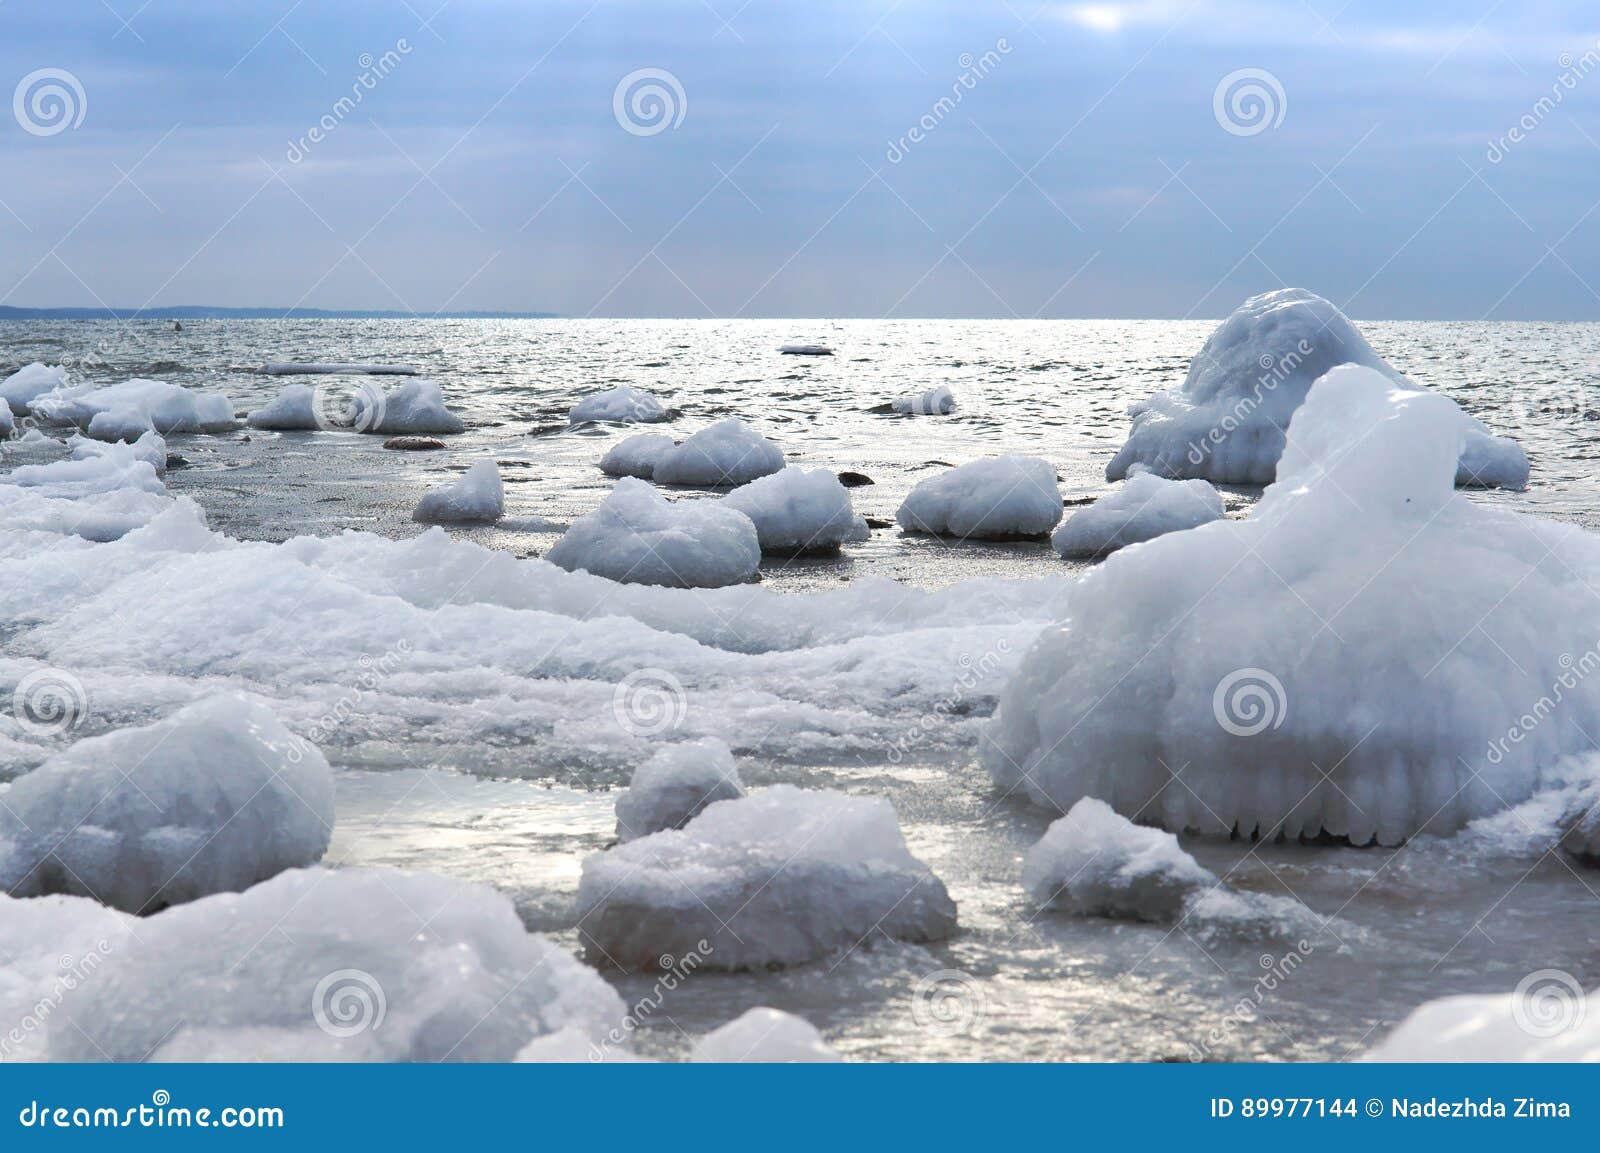 Glace, mer, neige, froid, hiver, paysage, voyage, Baltique, tourisme